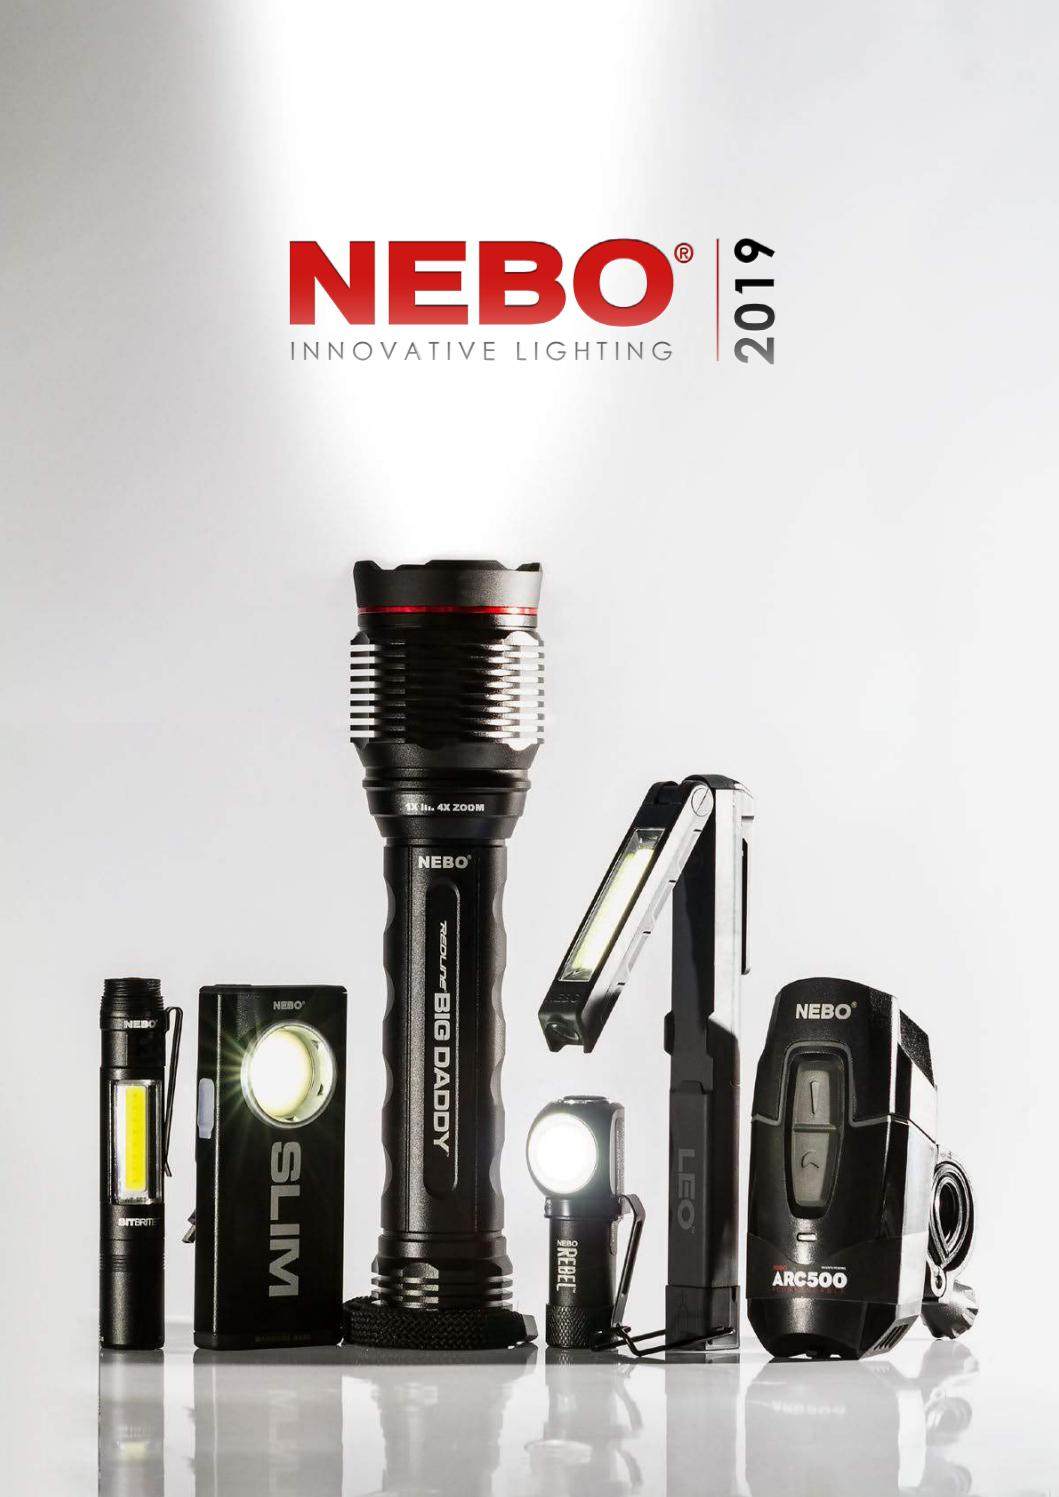 NEBO INNOVATIVE LIGHTING by Cataloghi Online - issuu